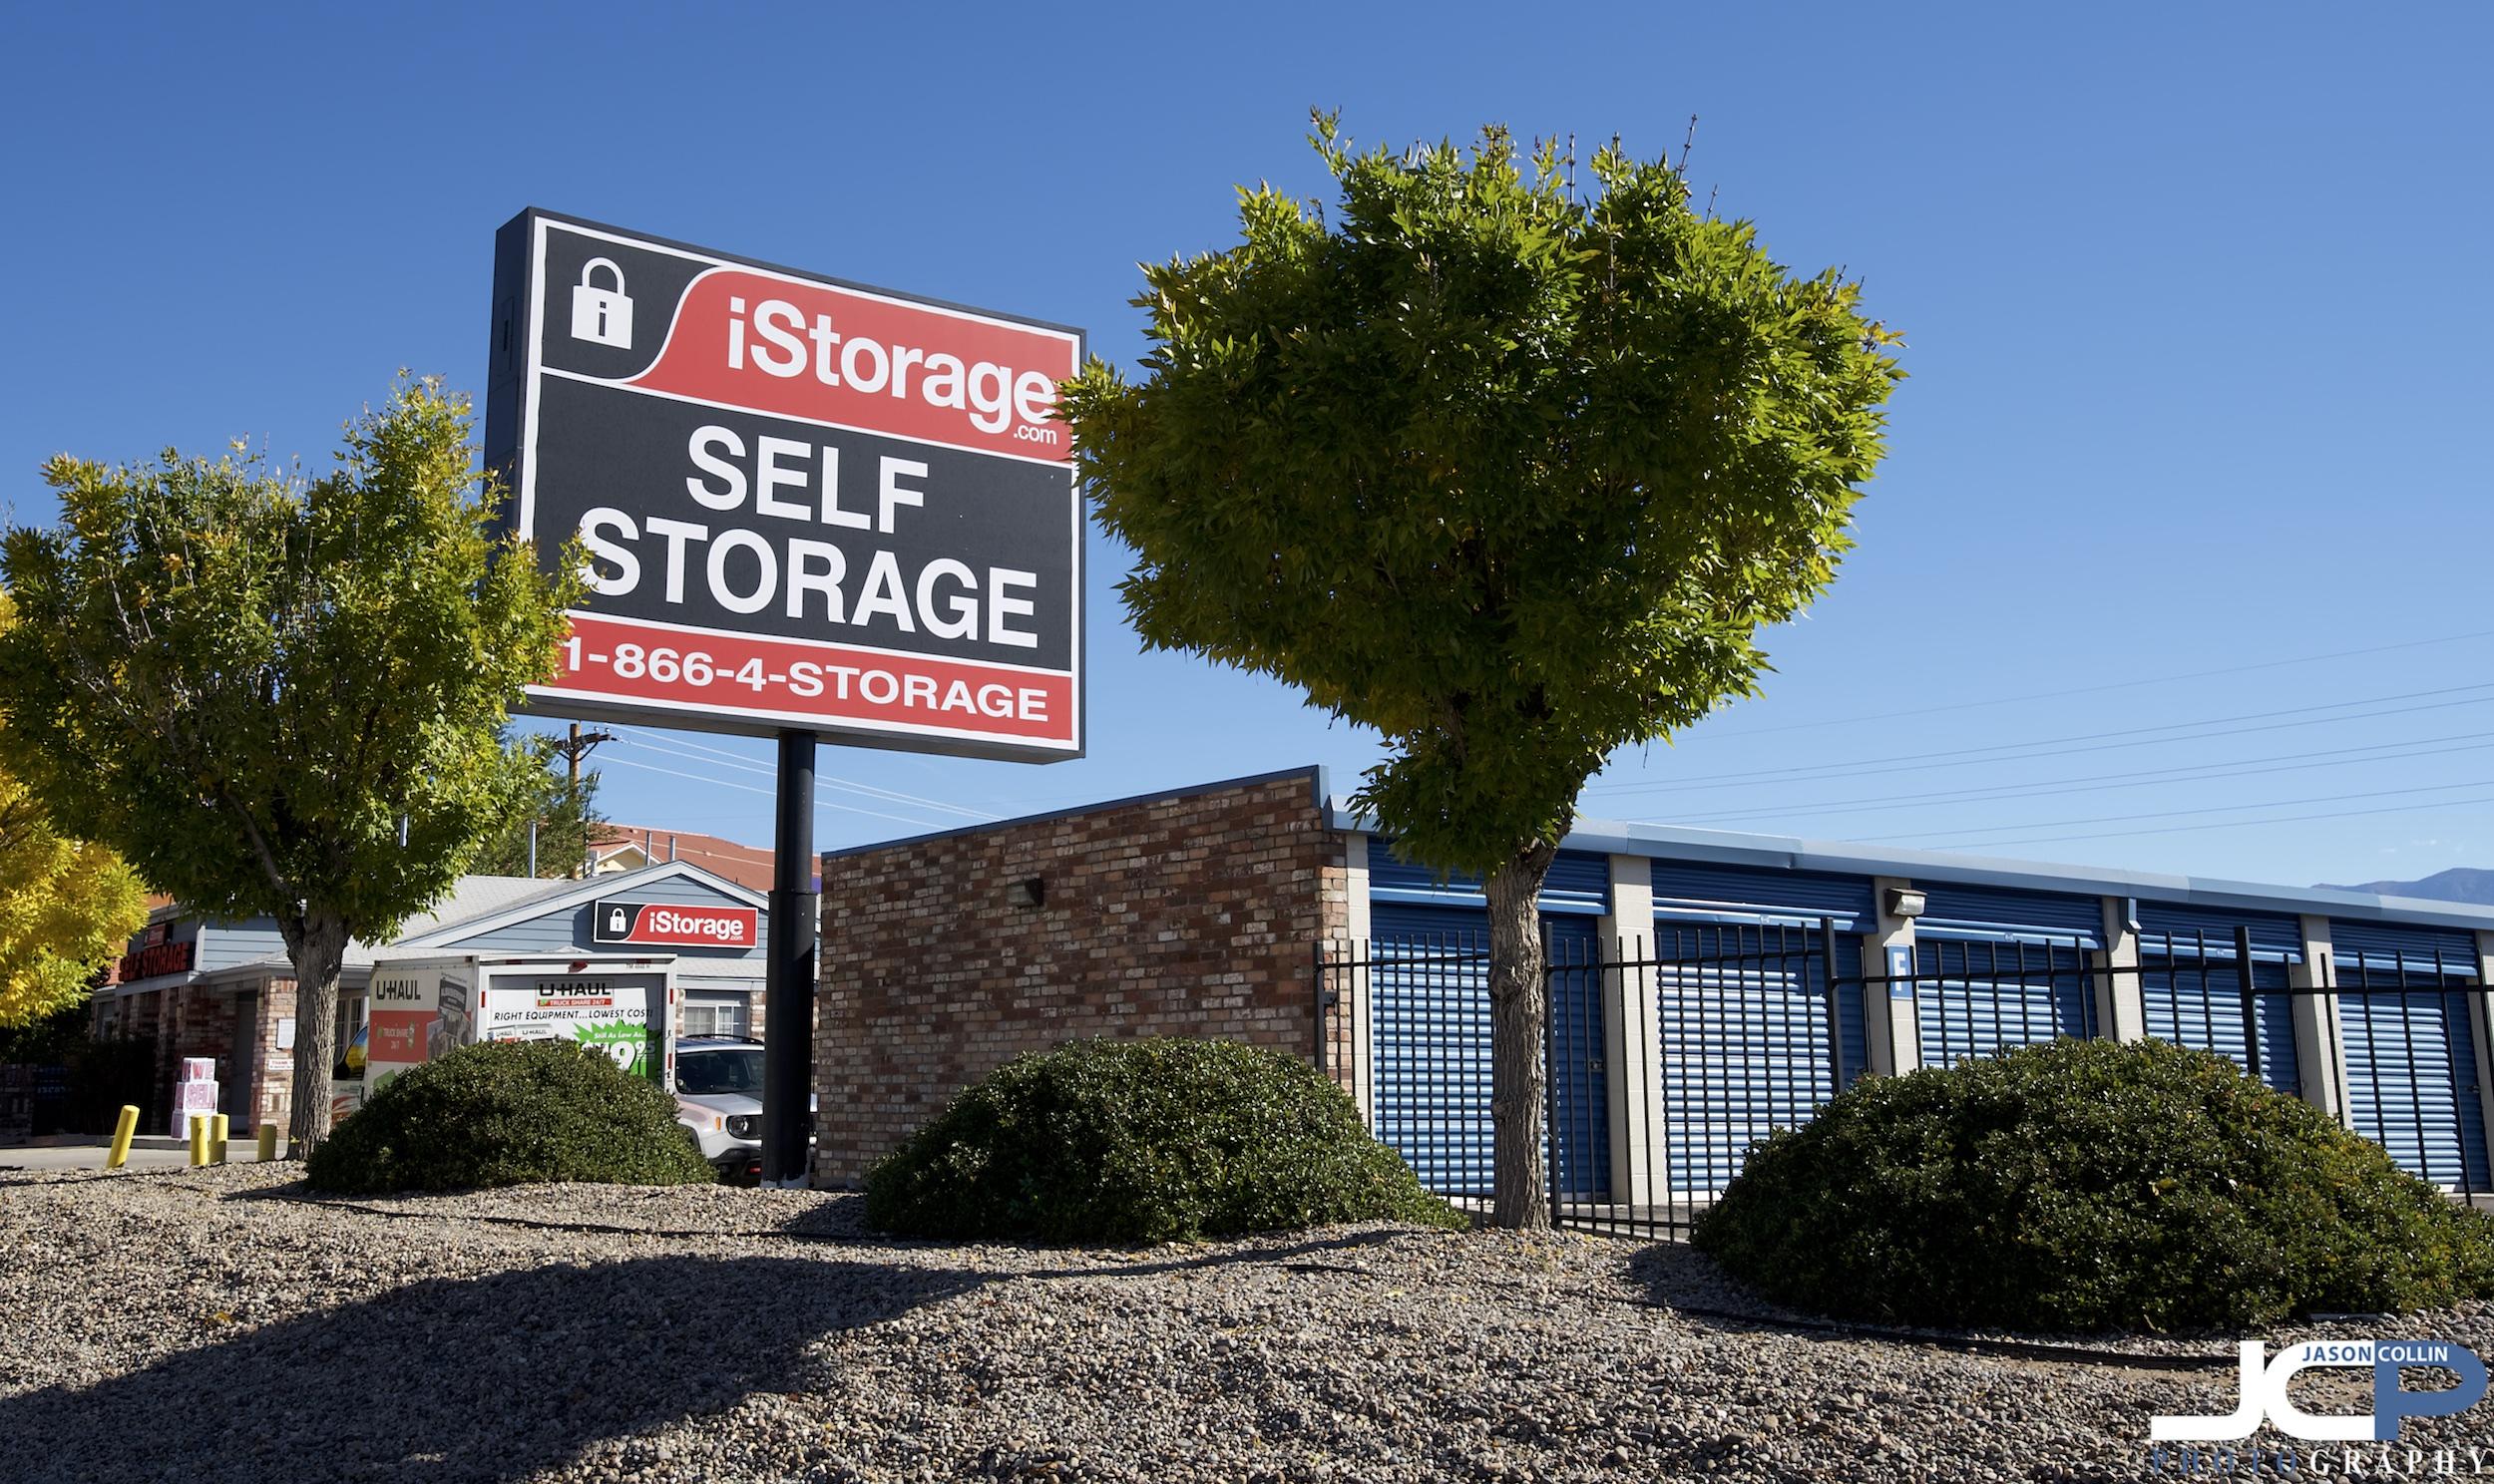 self-storage-10-25-2018-abq-110290.jpg